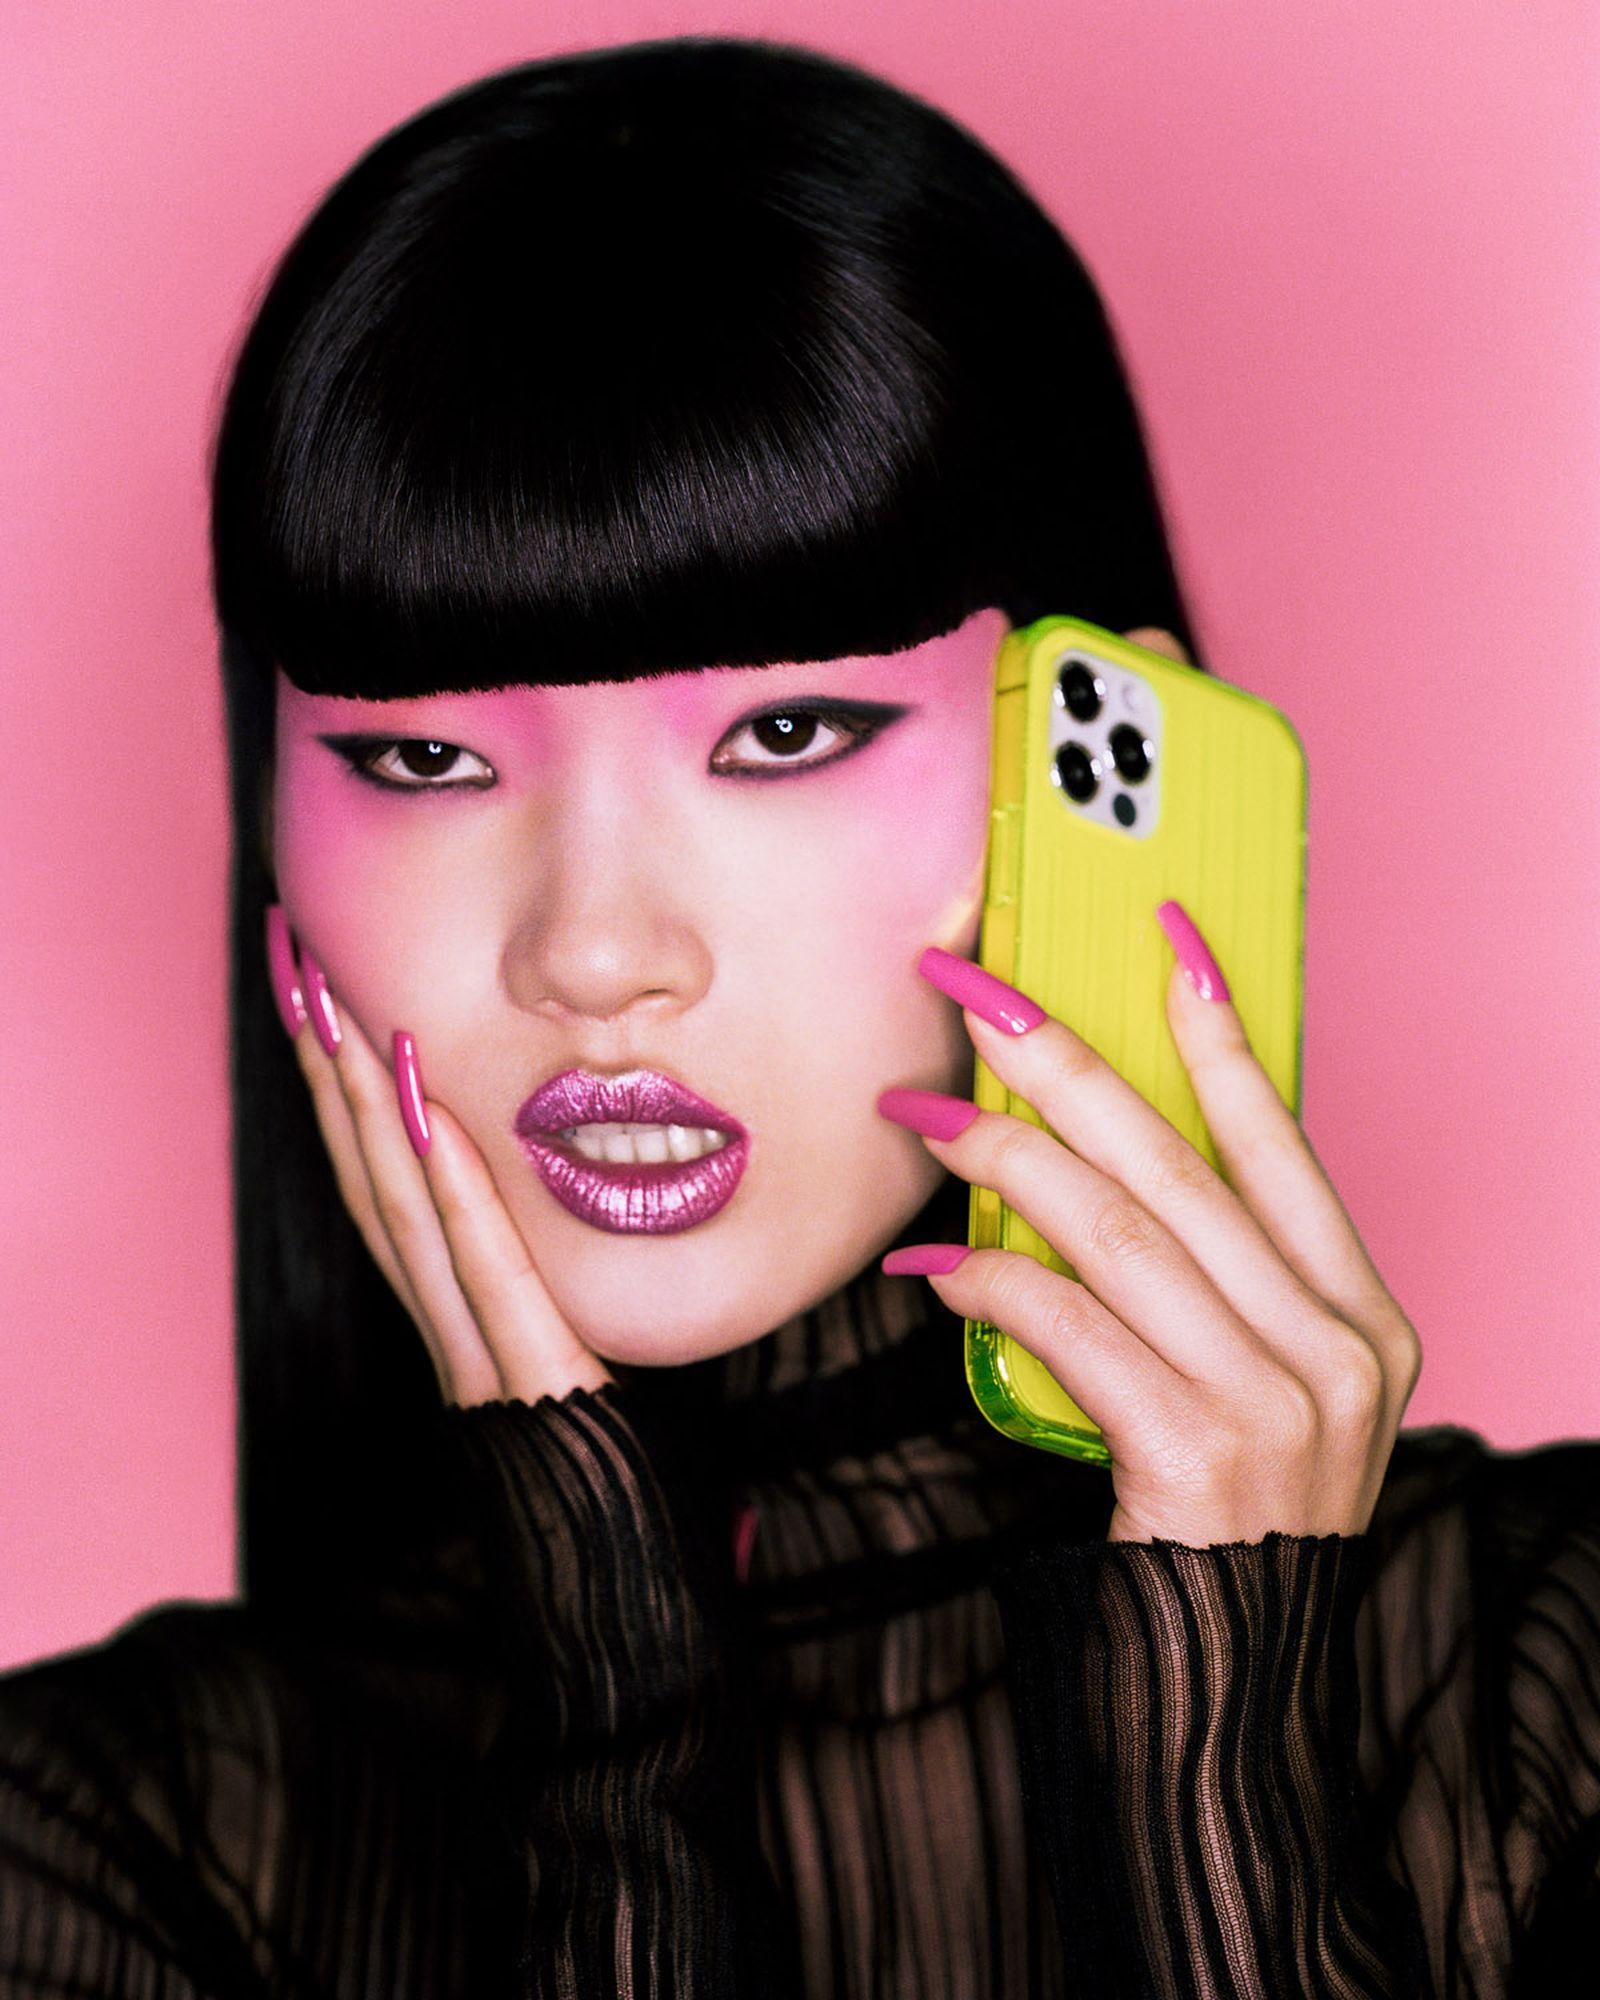 instagram-curators-new-influencers-rimowa-03